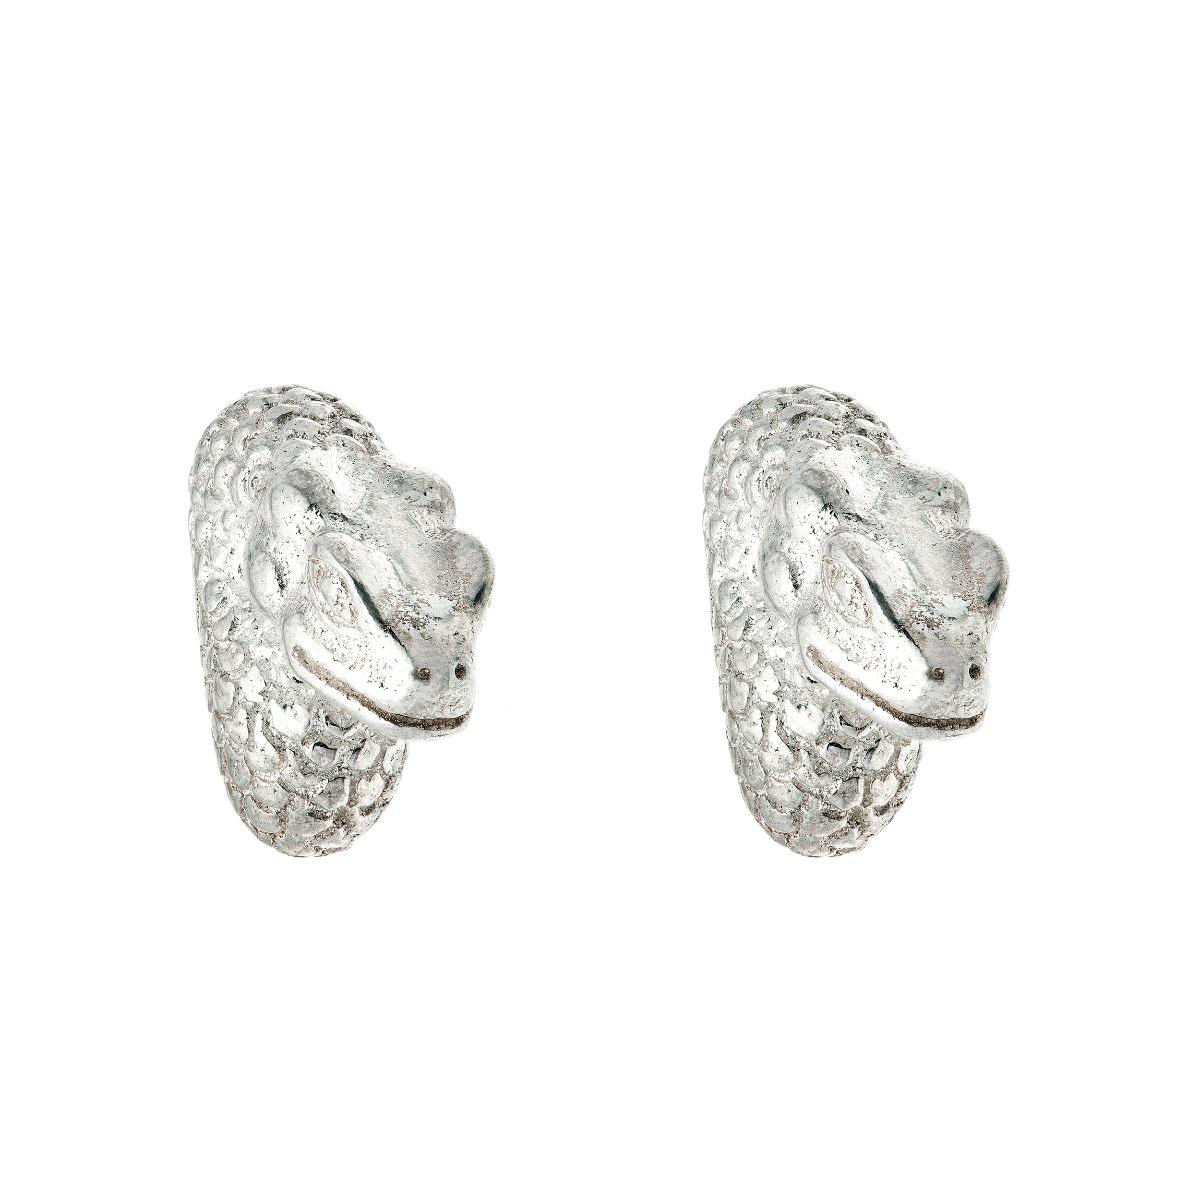 Chinese zodiac stud earrings (snake)